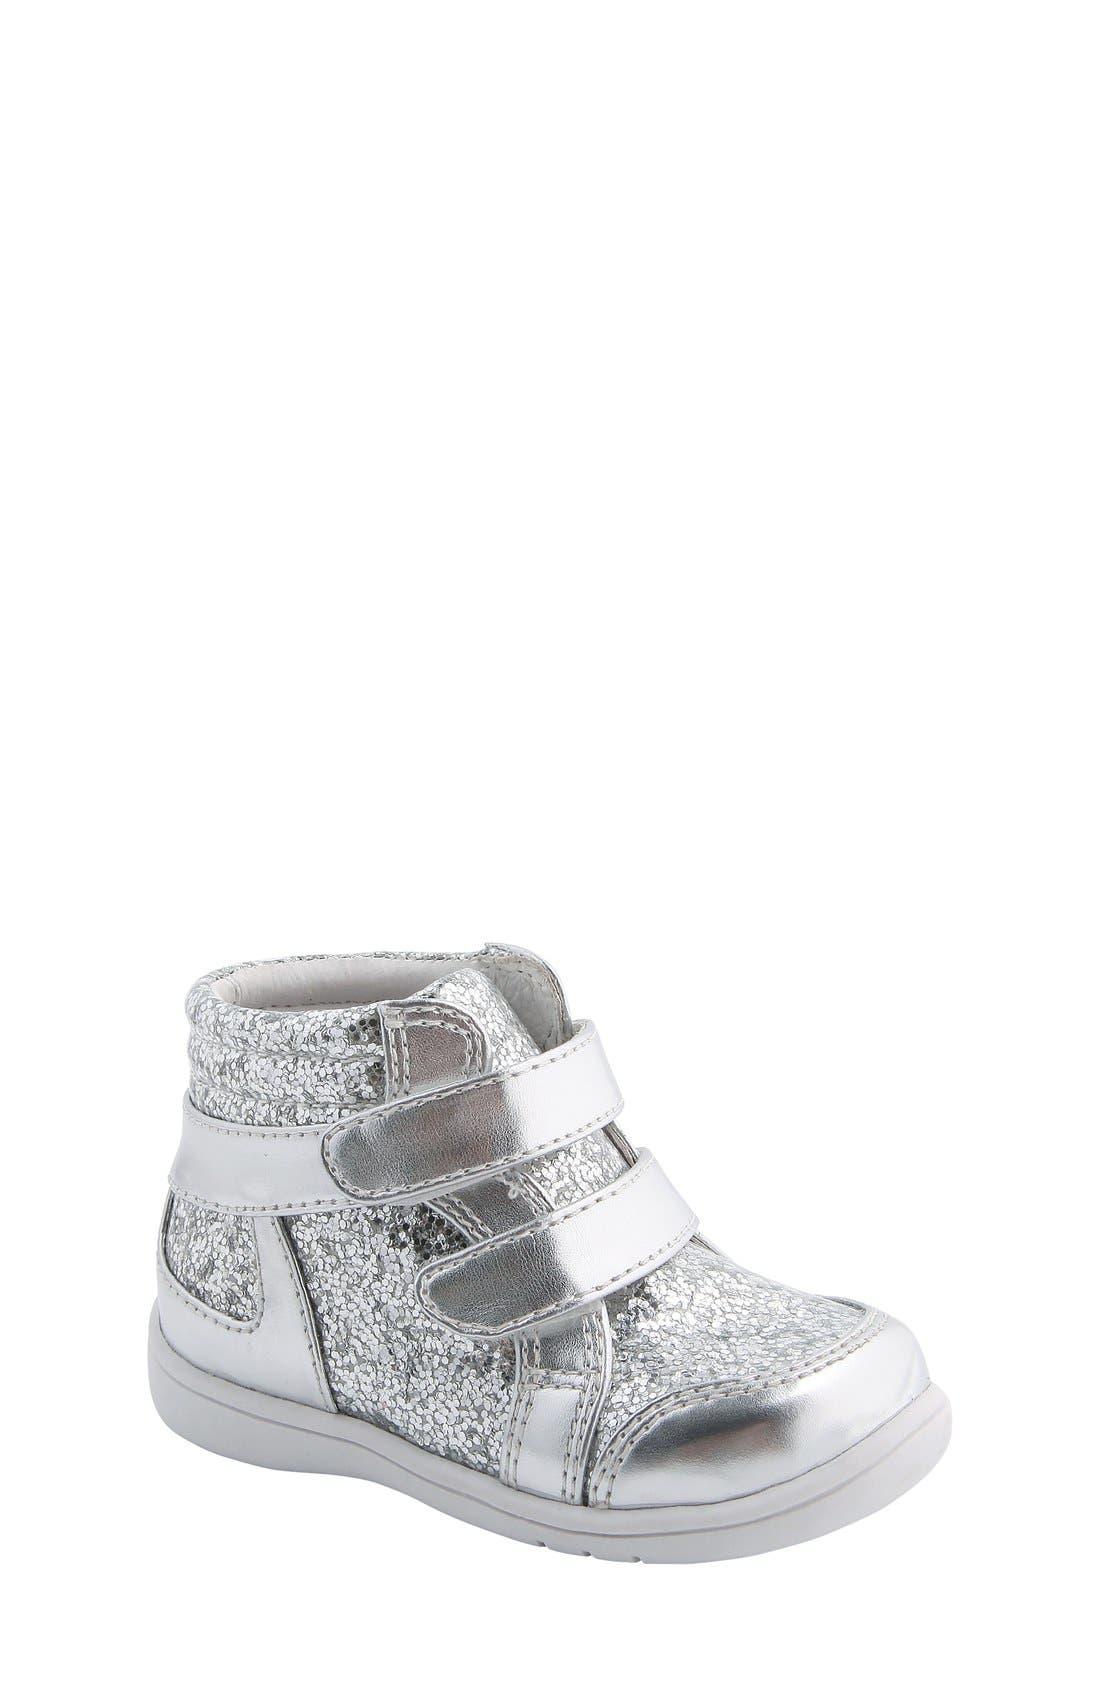 Nina 'Stardust' Metallic High Top Sneaker,                         Main,                         color, Silver Metallic